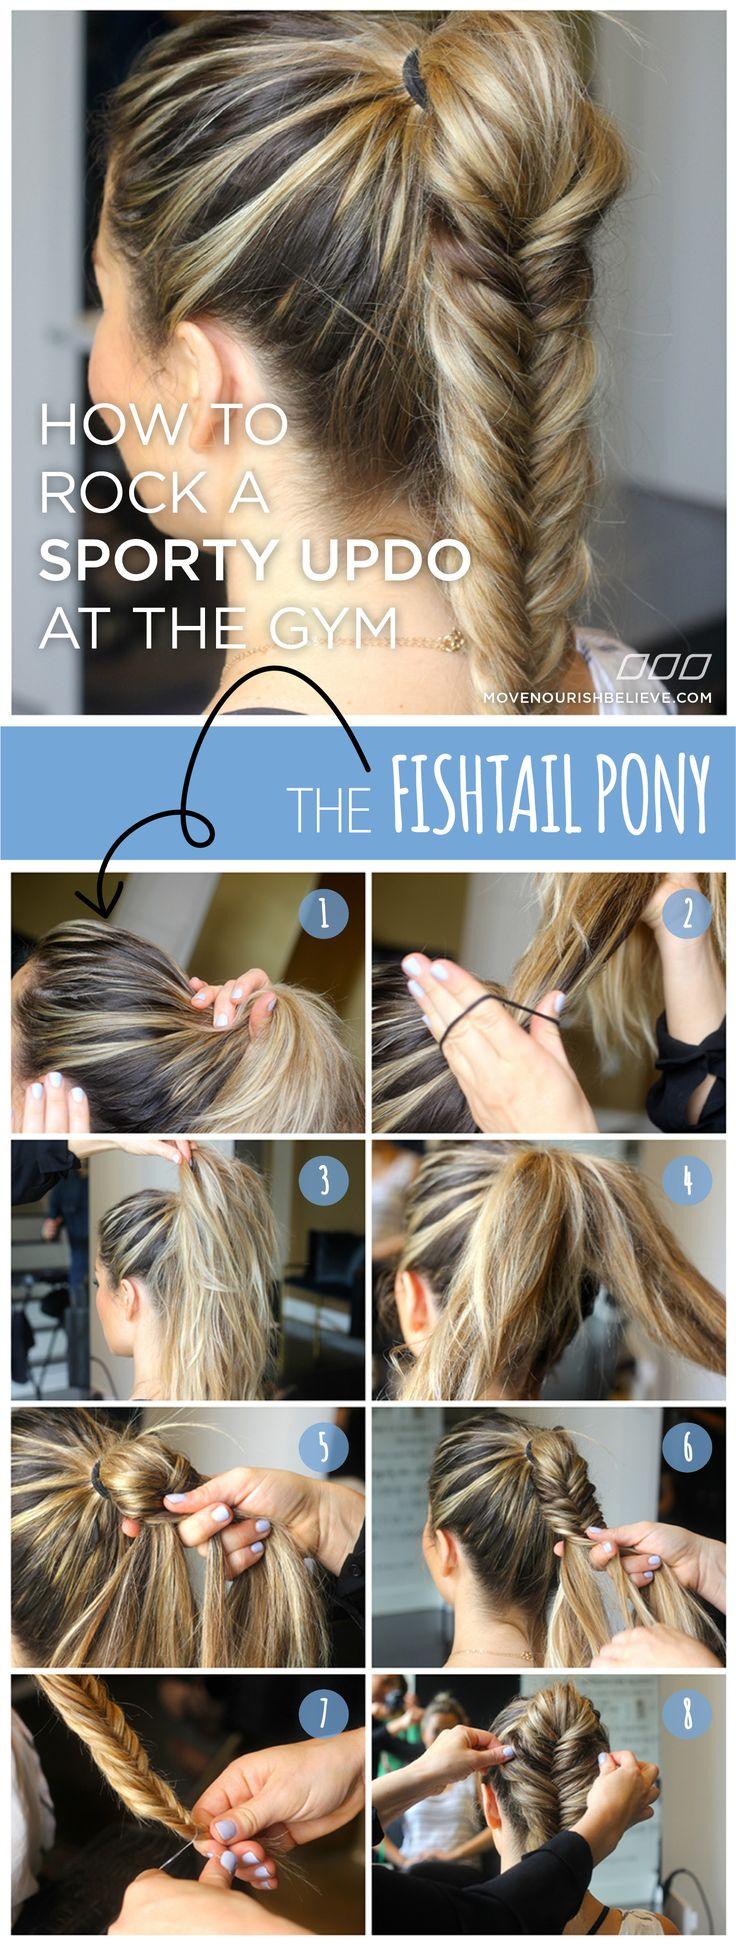 great alternative to a pony tail